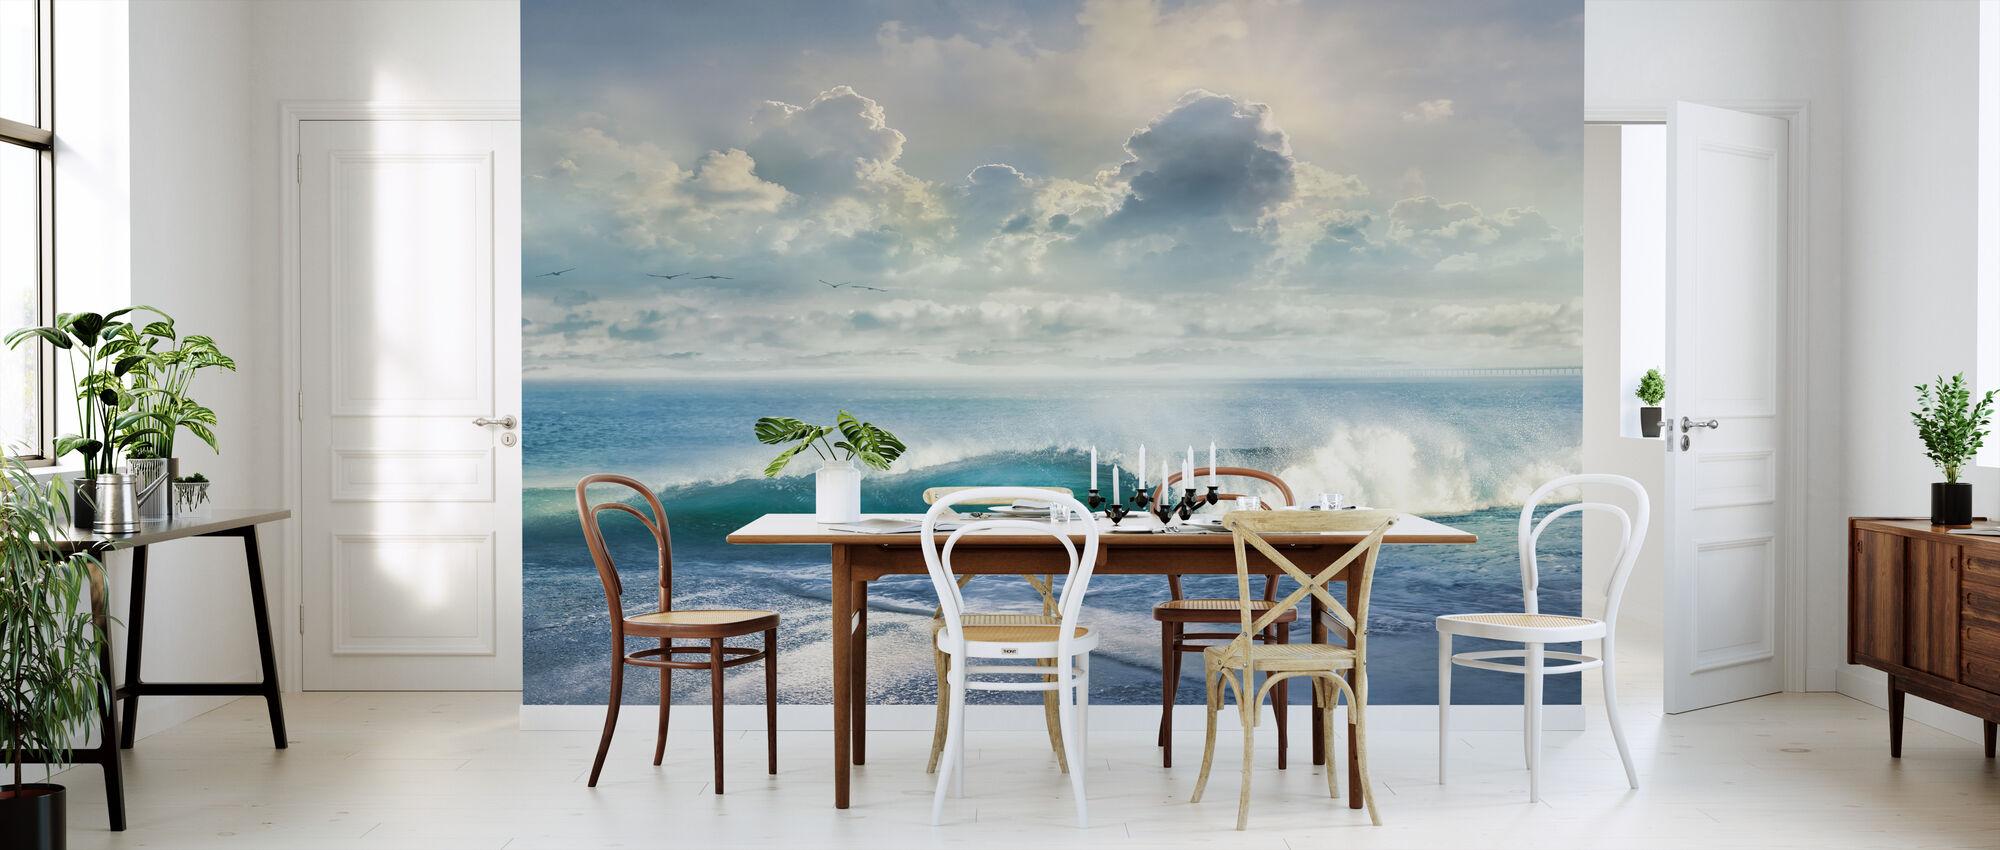 Stormy Sea - Wallpaper - Kitchen